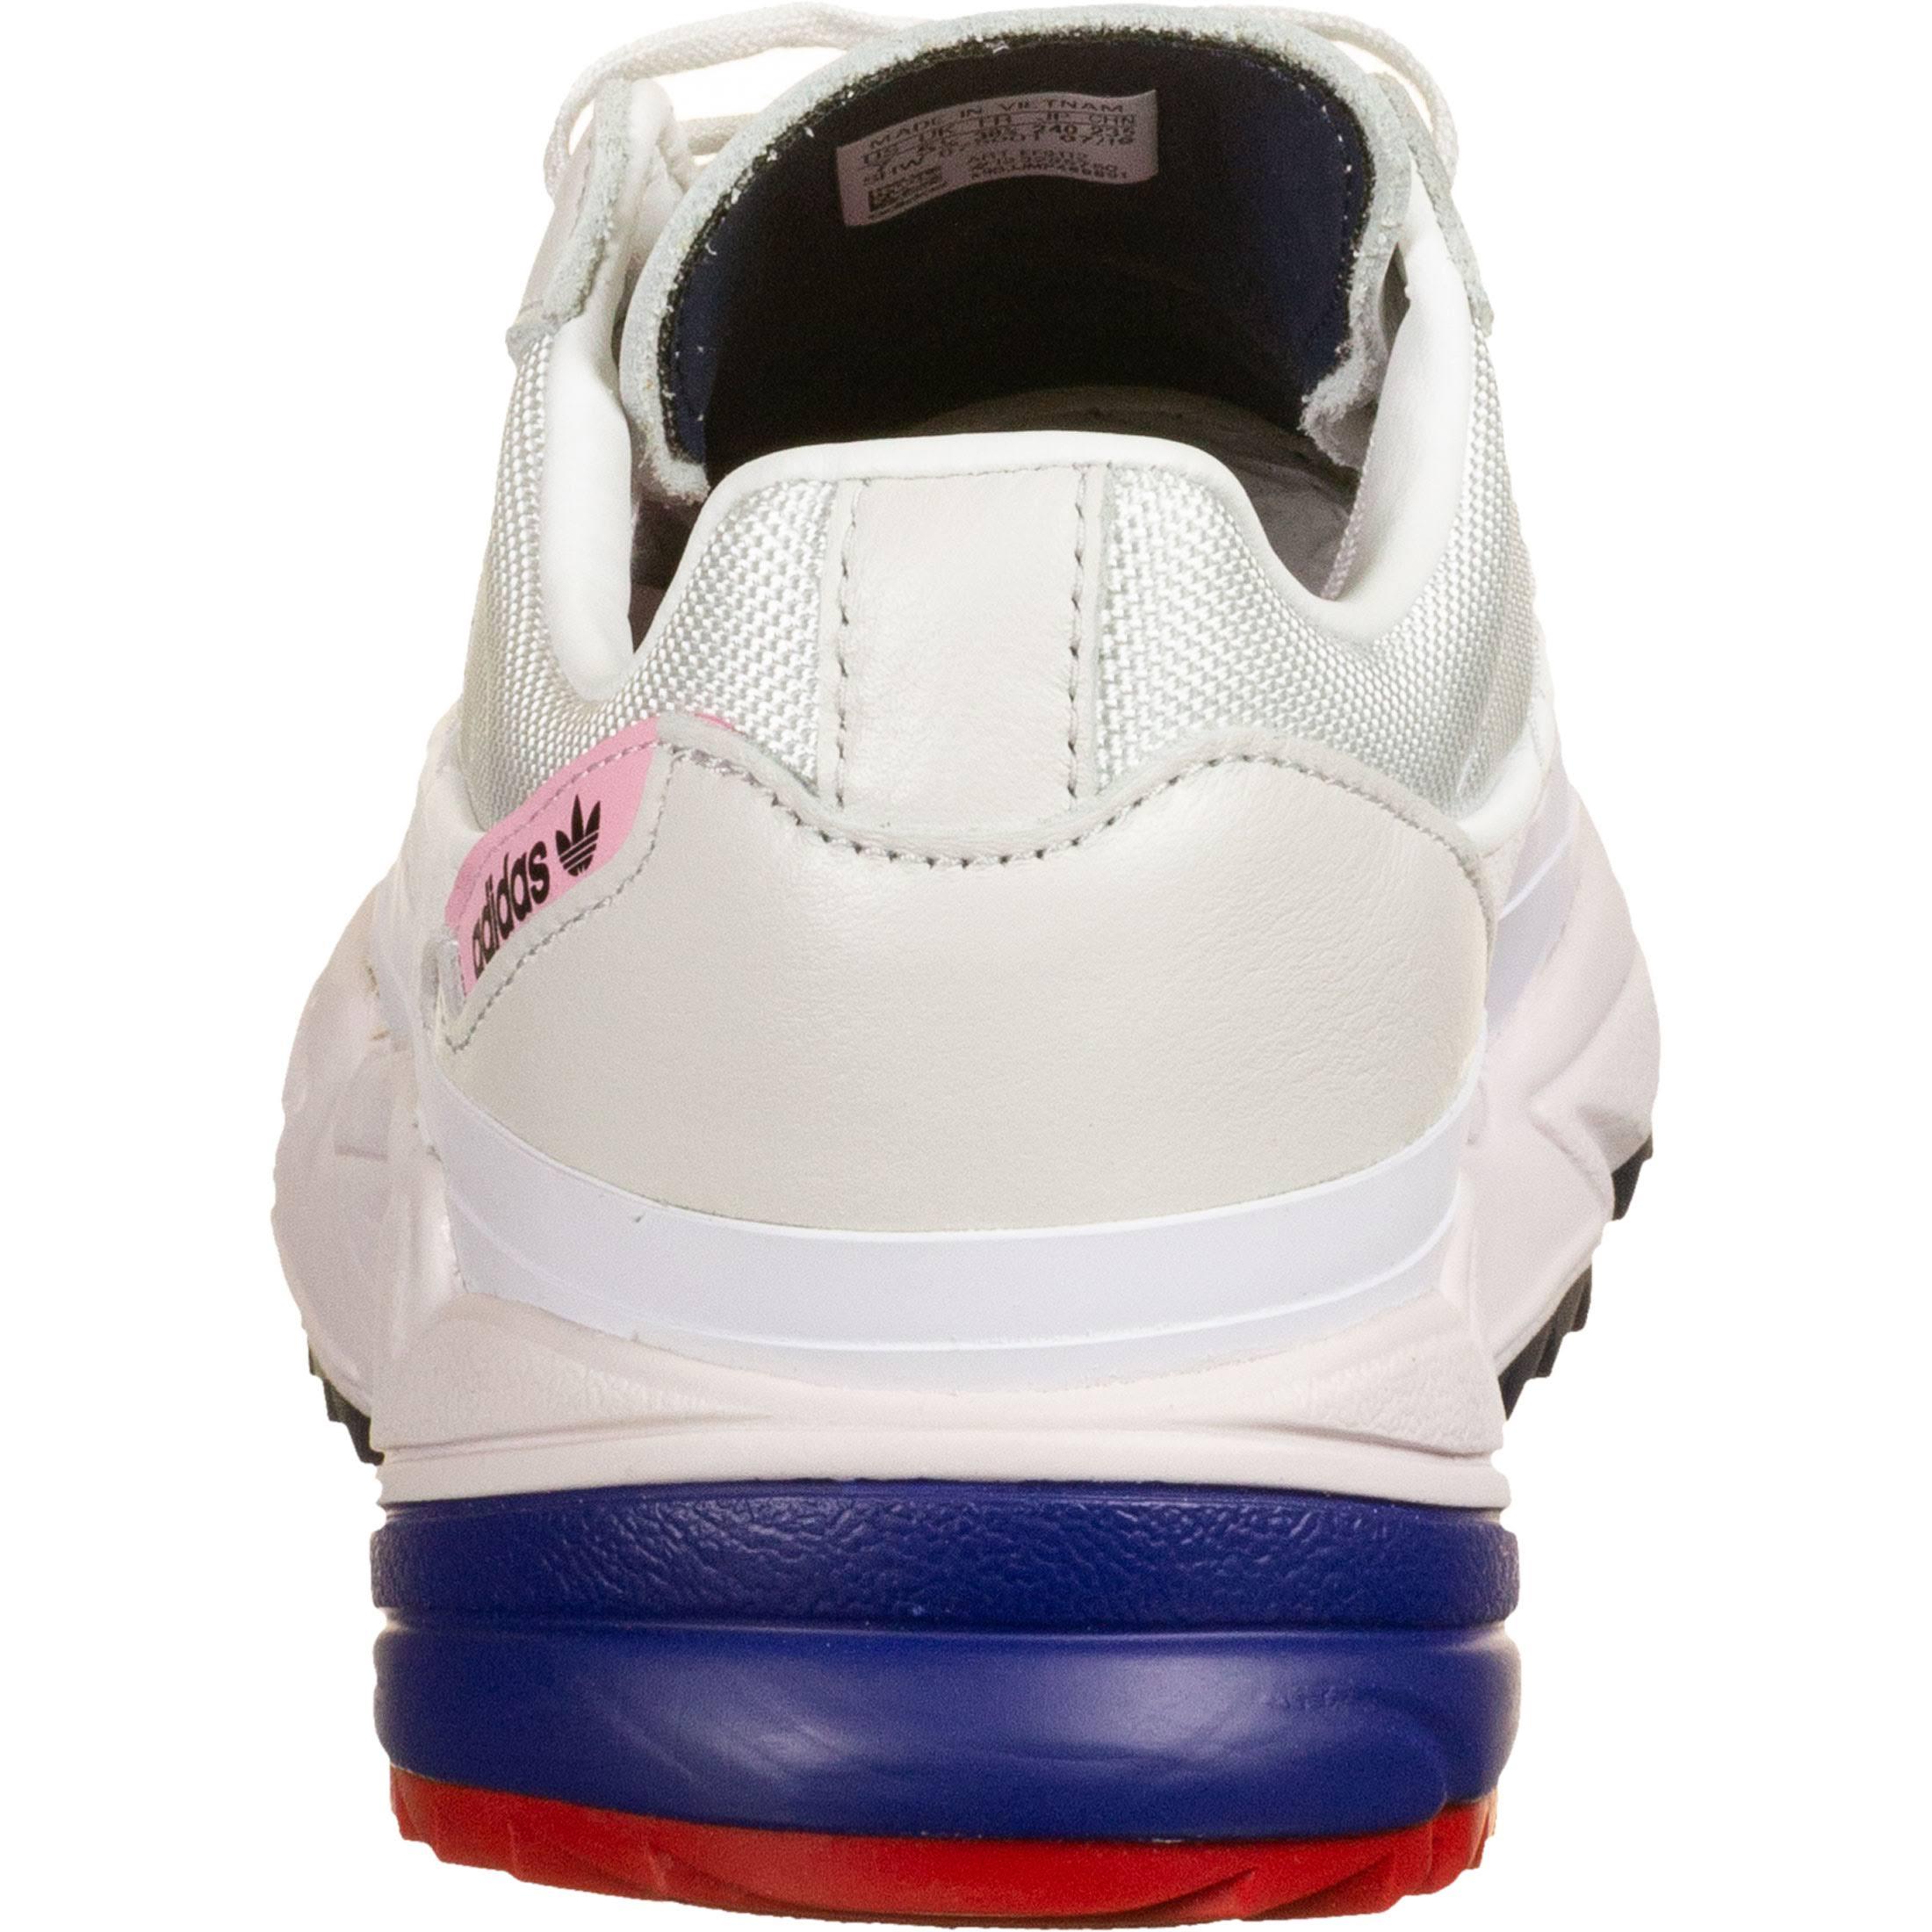 Adidas Scarpe Kiellor - Outlet  D61Dwi